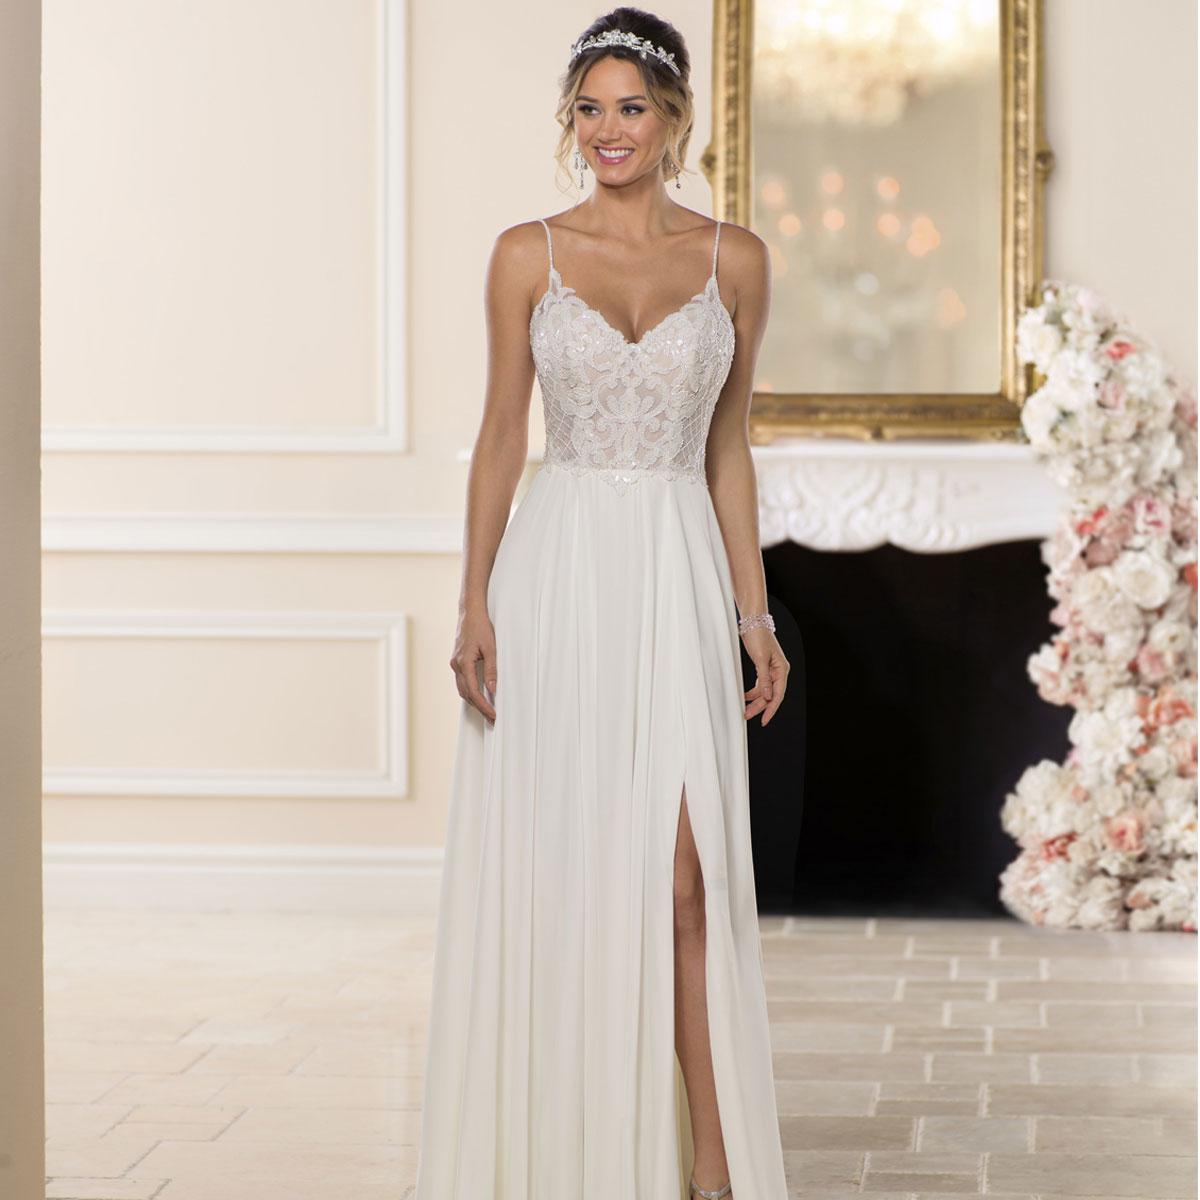 Beach Wedding Dress Trend